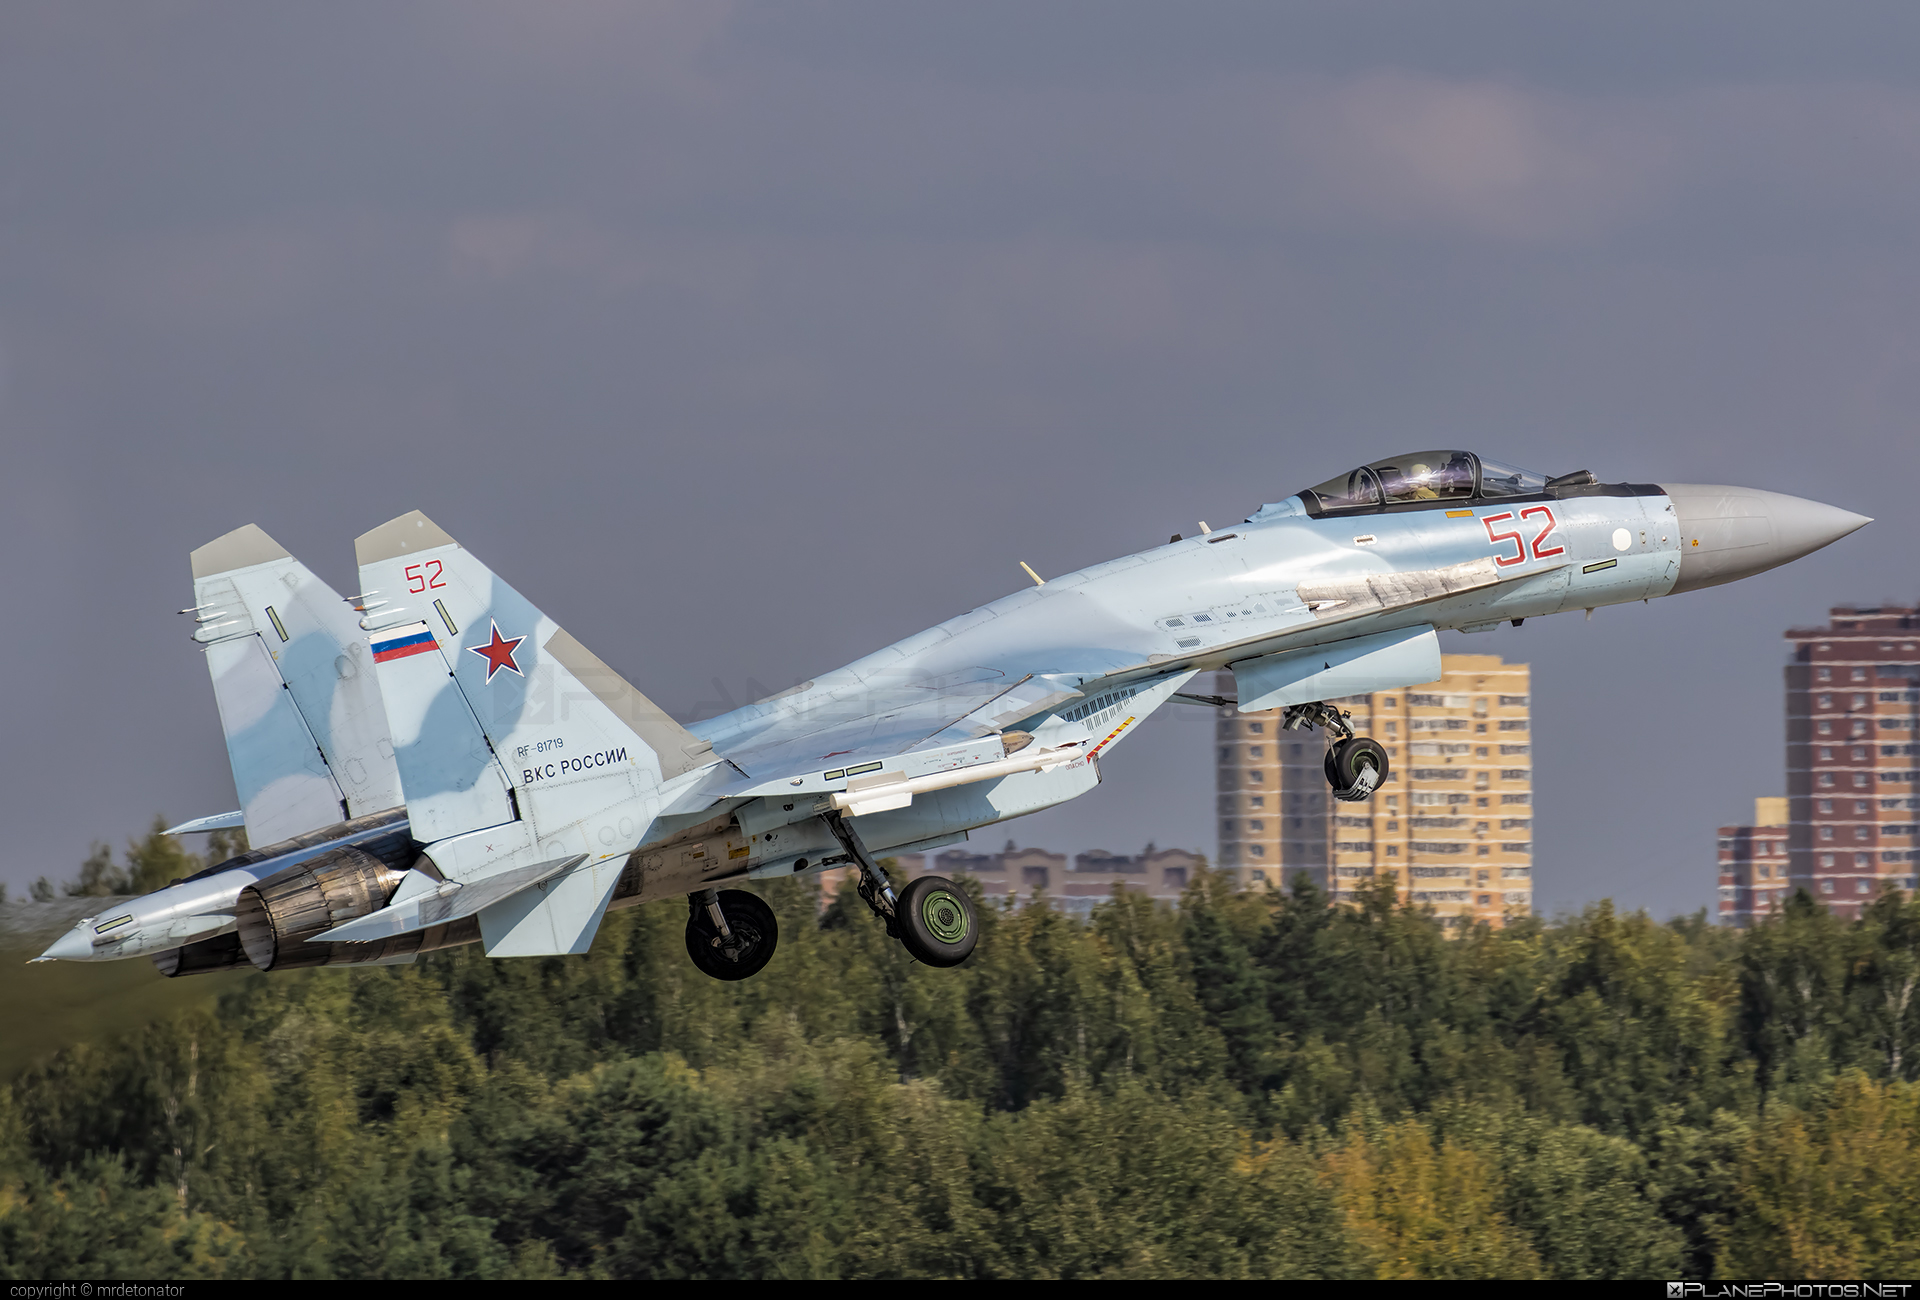 Sukhoi Su-35S - RF-81719 operated by Vozdushno-kosmicheskiye sily Rossii (Russian Aerospace Forces) #maks2019 #russianaerospaceforces #su35 #su35s #sukhoi #sukhoi35 #sukhoisu35s #vozdushnokosmicheskiyesilyrossii